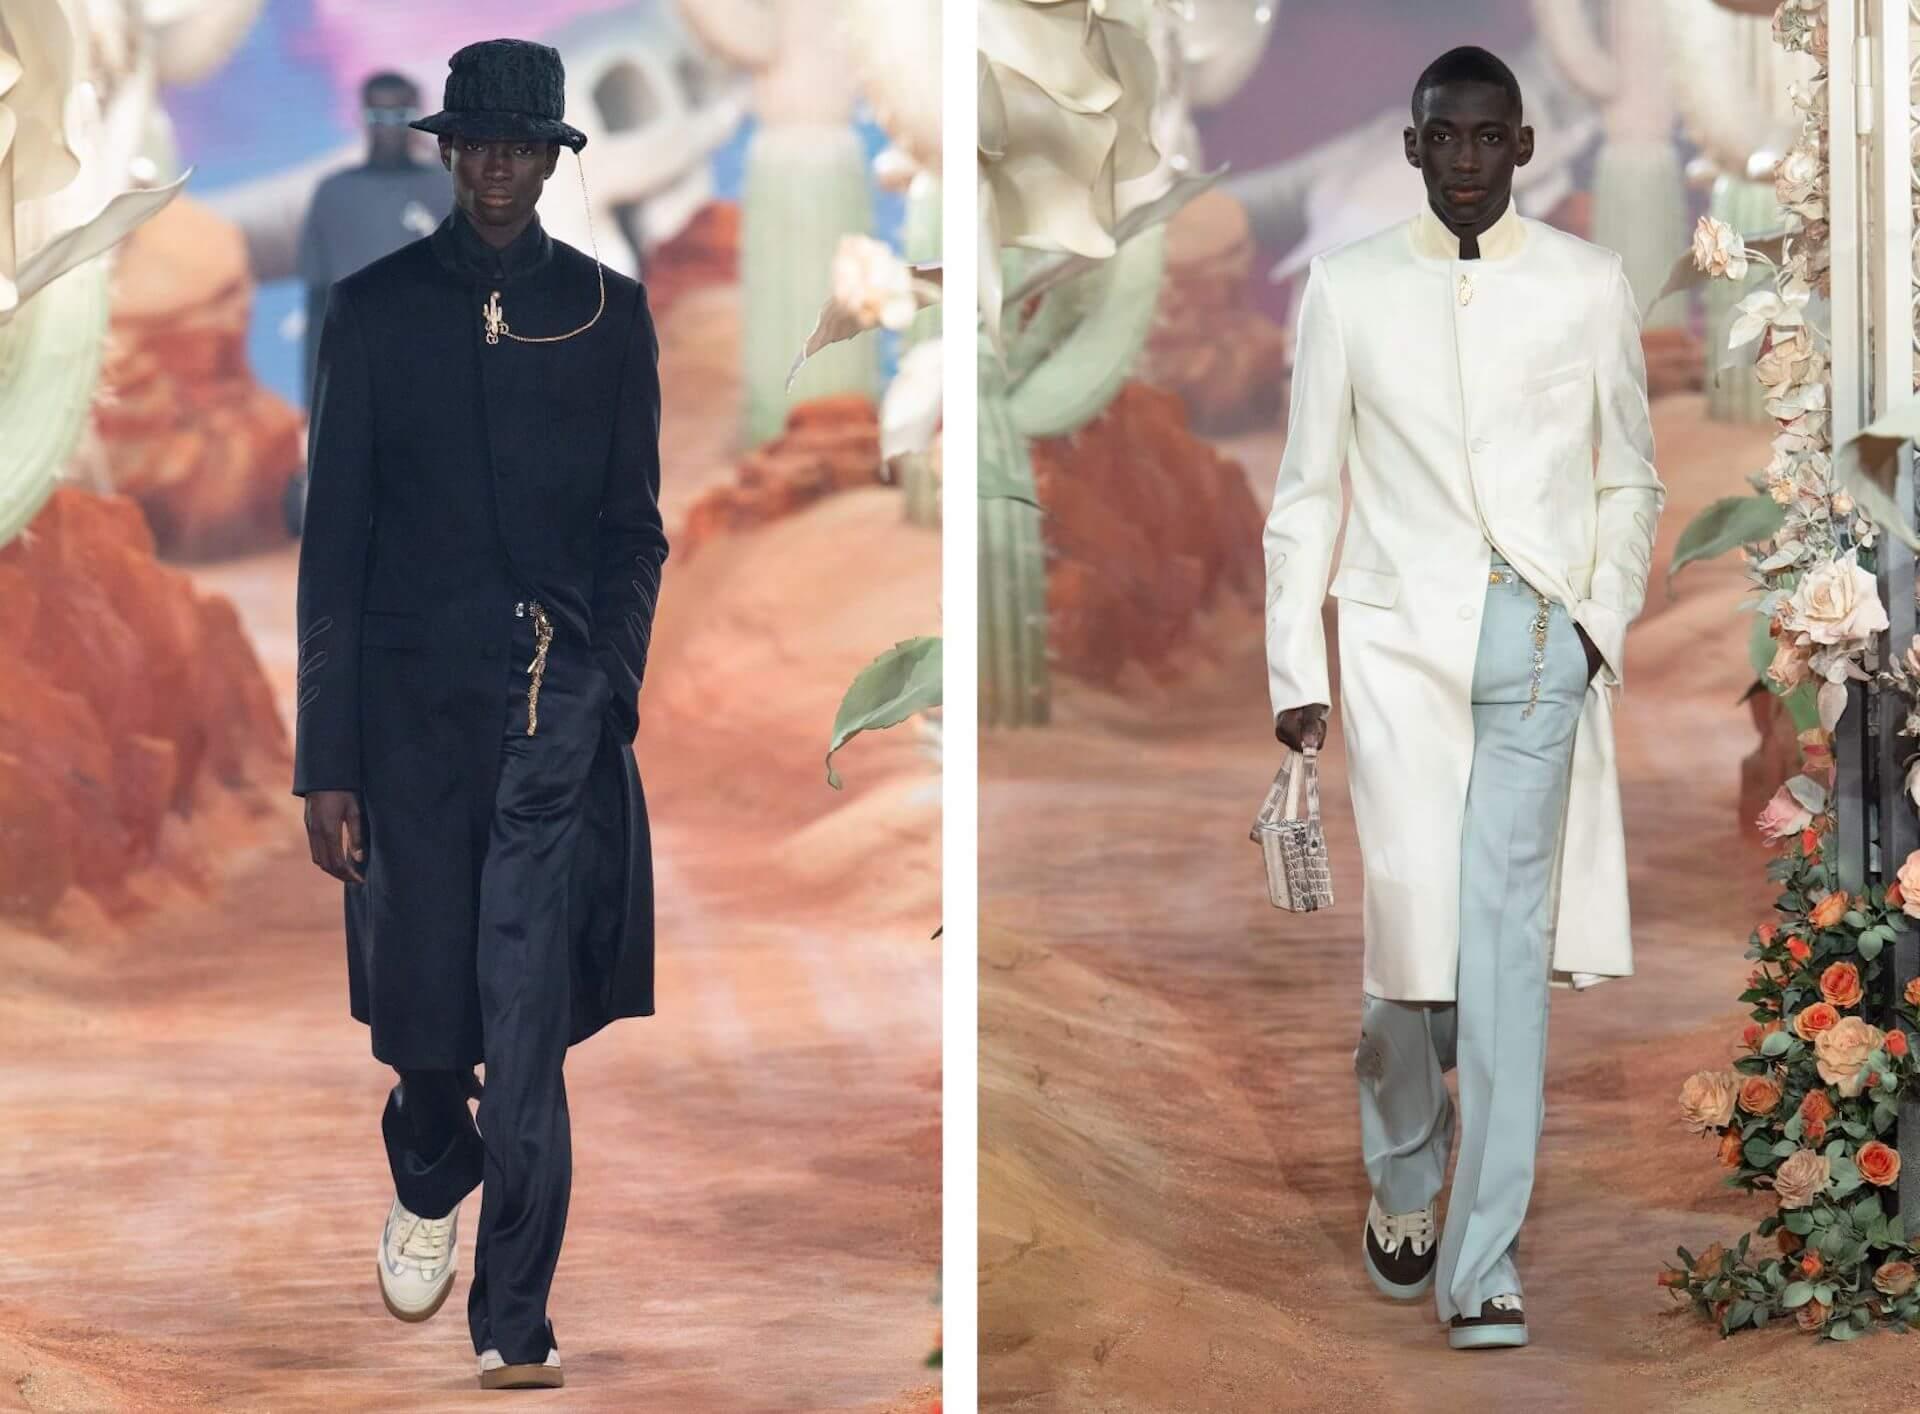 DiorがTravis Scottとコラボレーションし、サマー2022メンズコレクション ショーを開催! Fashion210625_Dior2